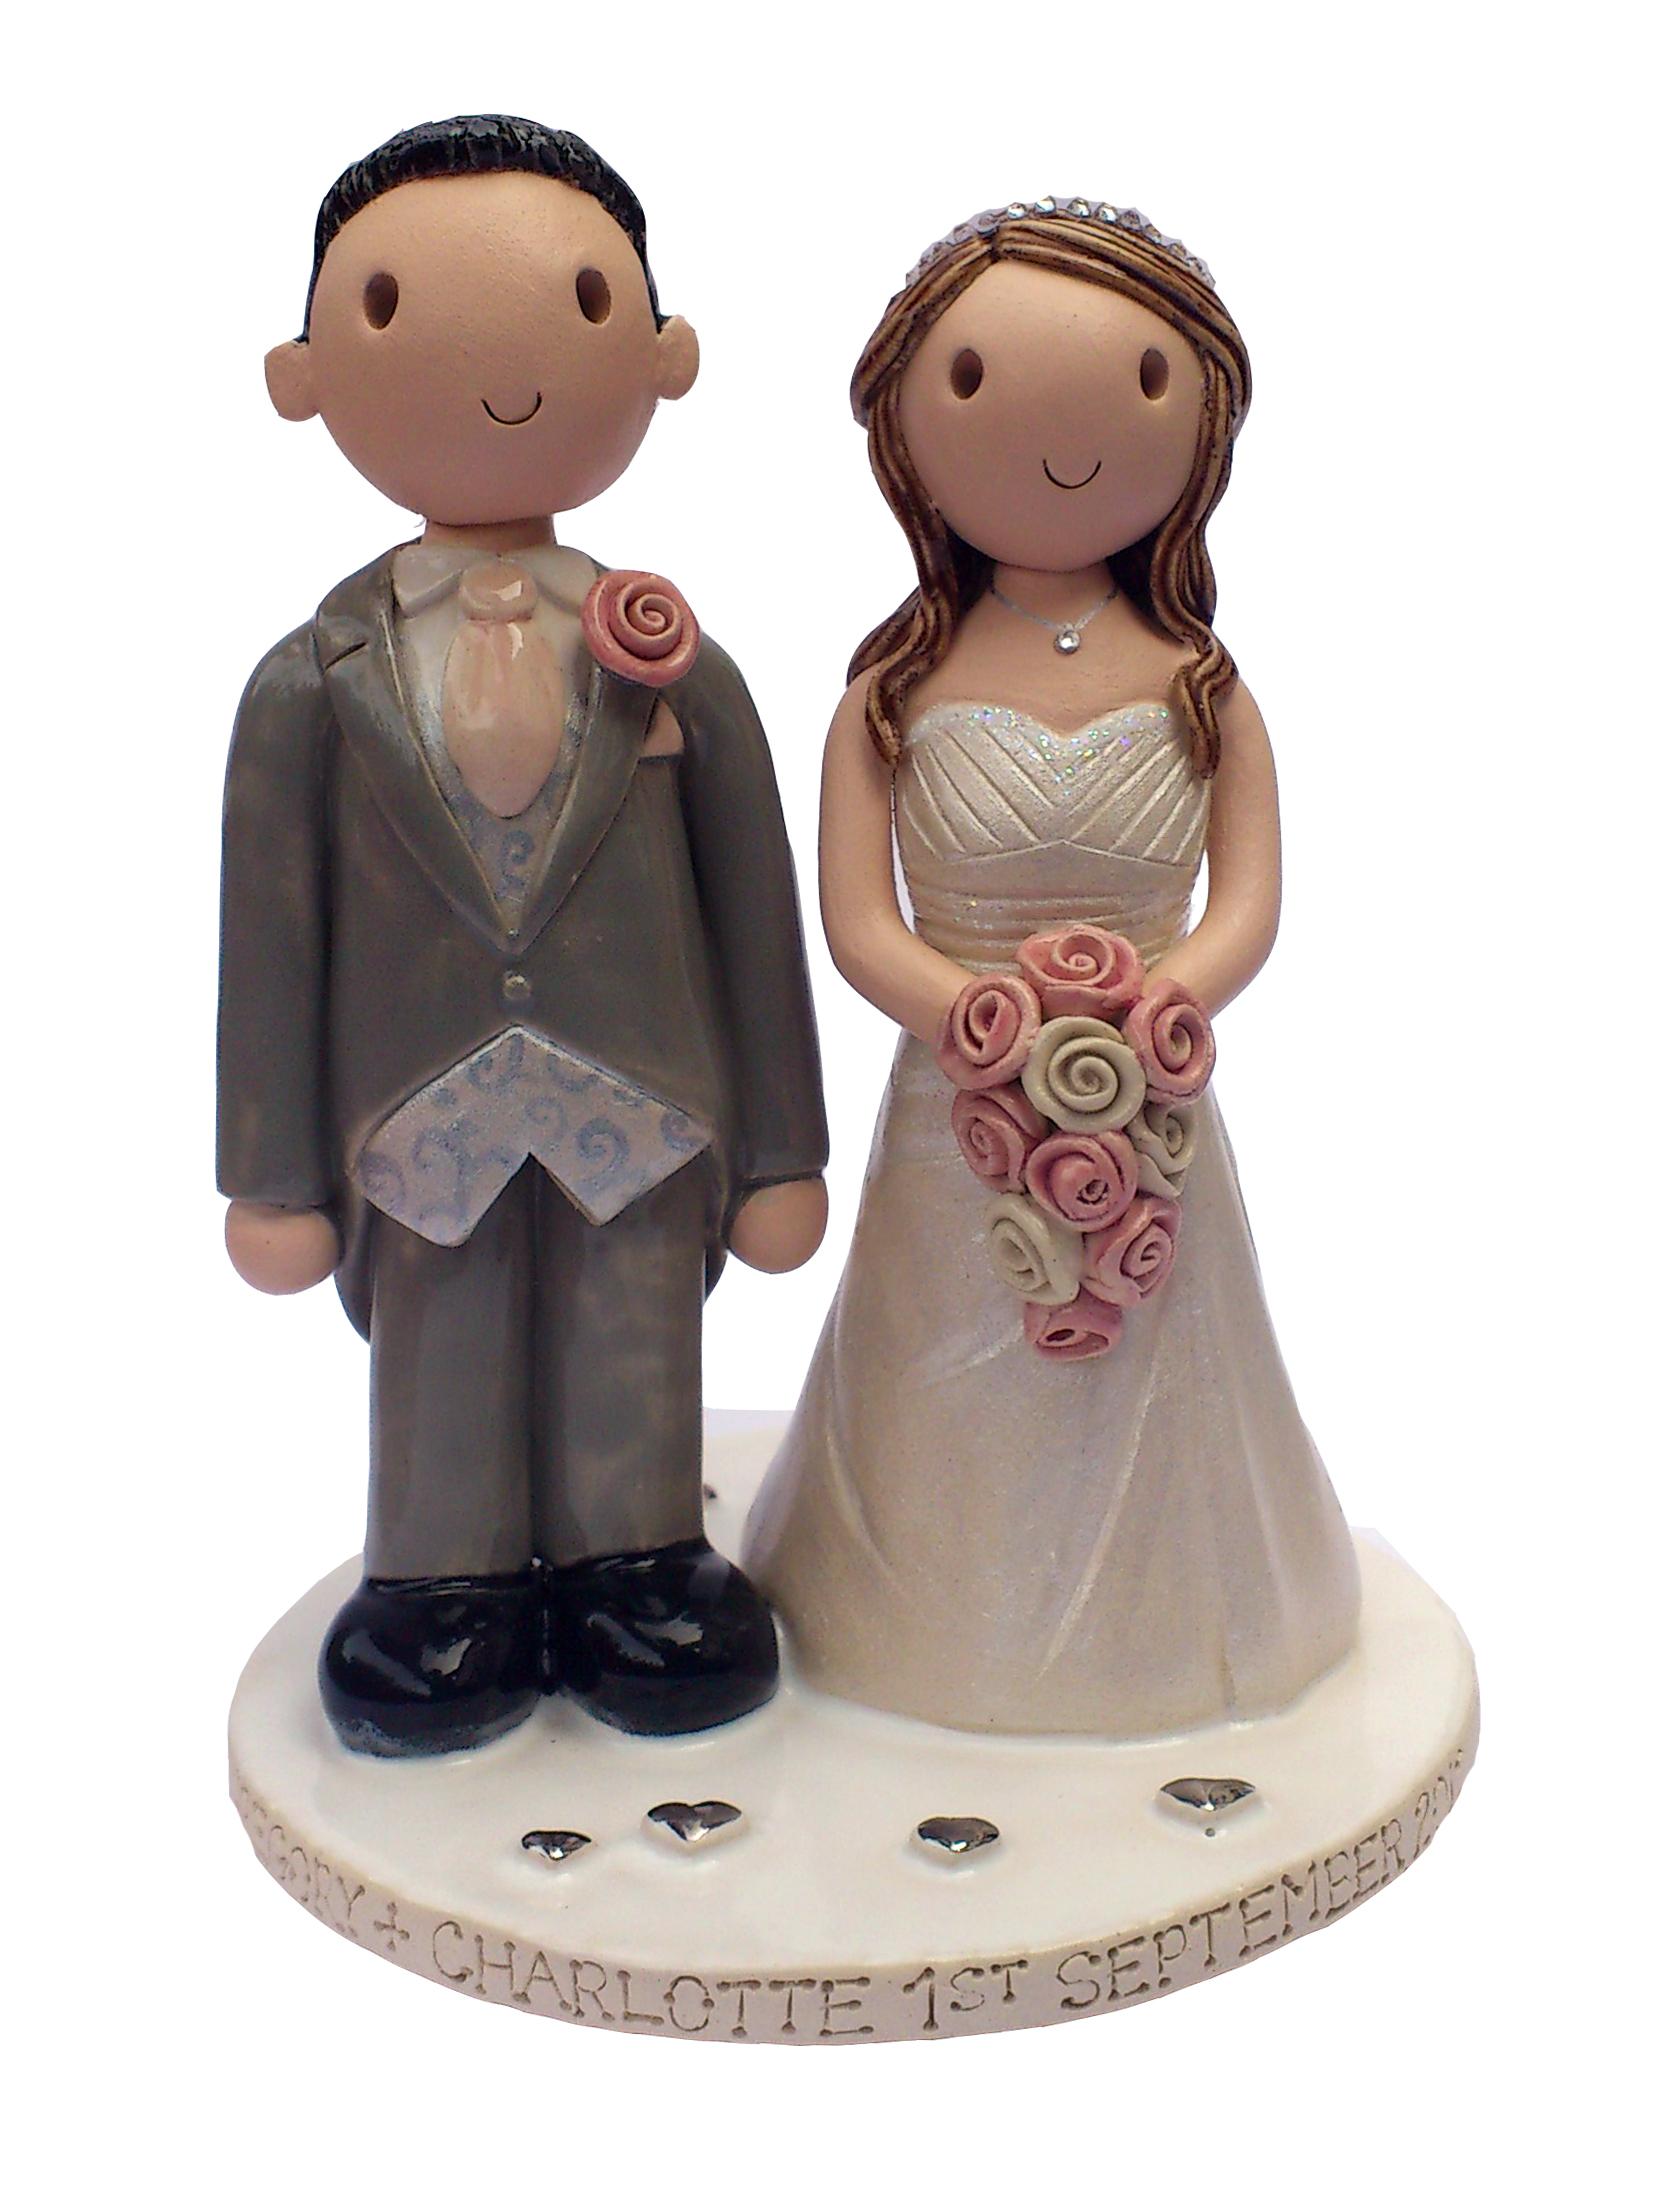 Weddings 3 4 Cake Toppers